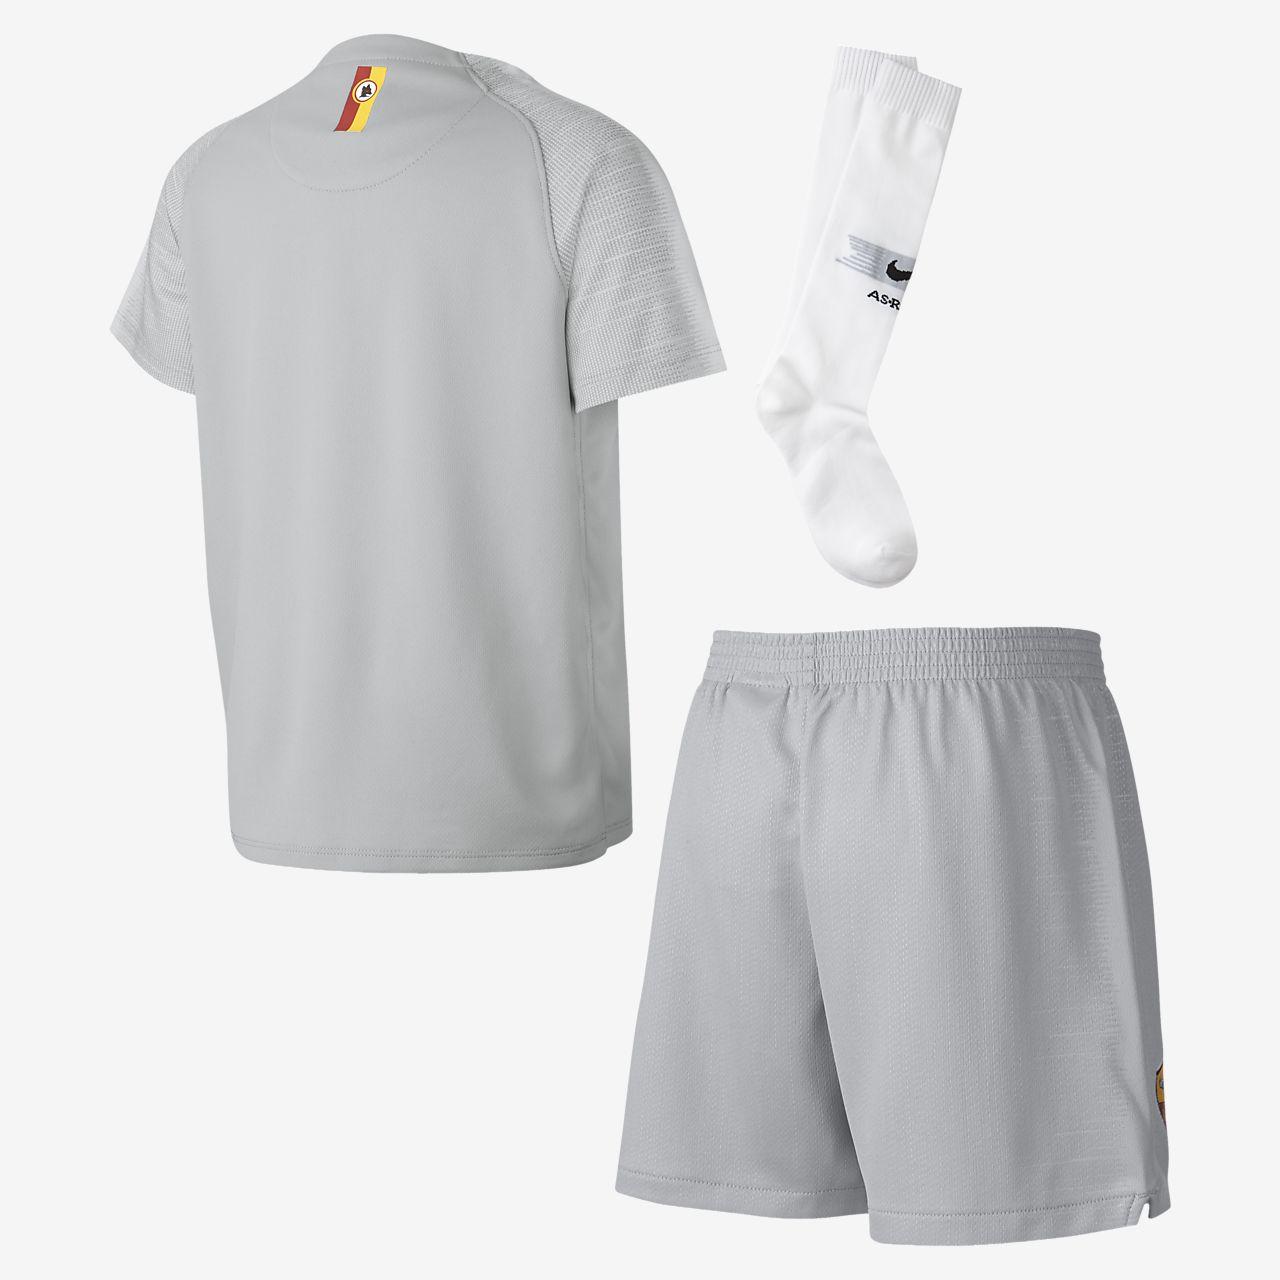 2018 19 AS Roma Stadium Away Younger Kids  Football Kit. Nike.com LU 67aa0bb22